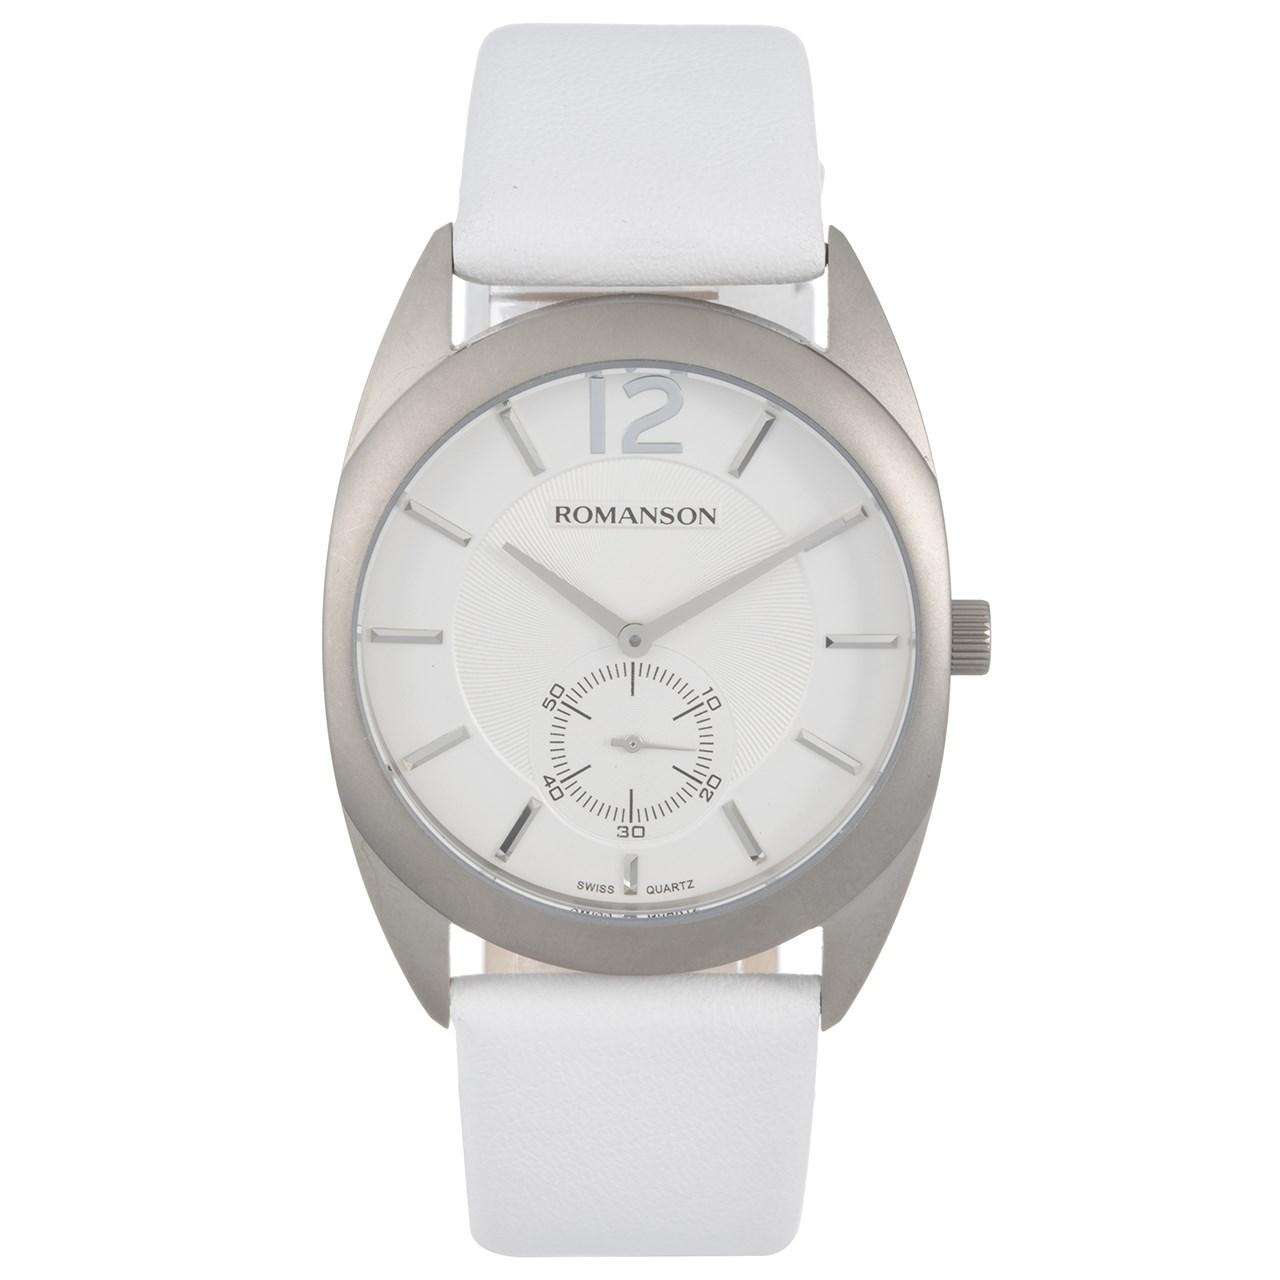 ساعت مچی عقربه ای مردانه رومانسون مدل TL1246MM1WAS2W 12